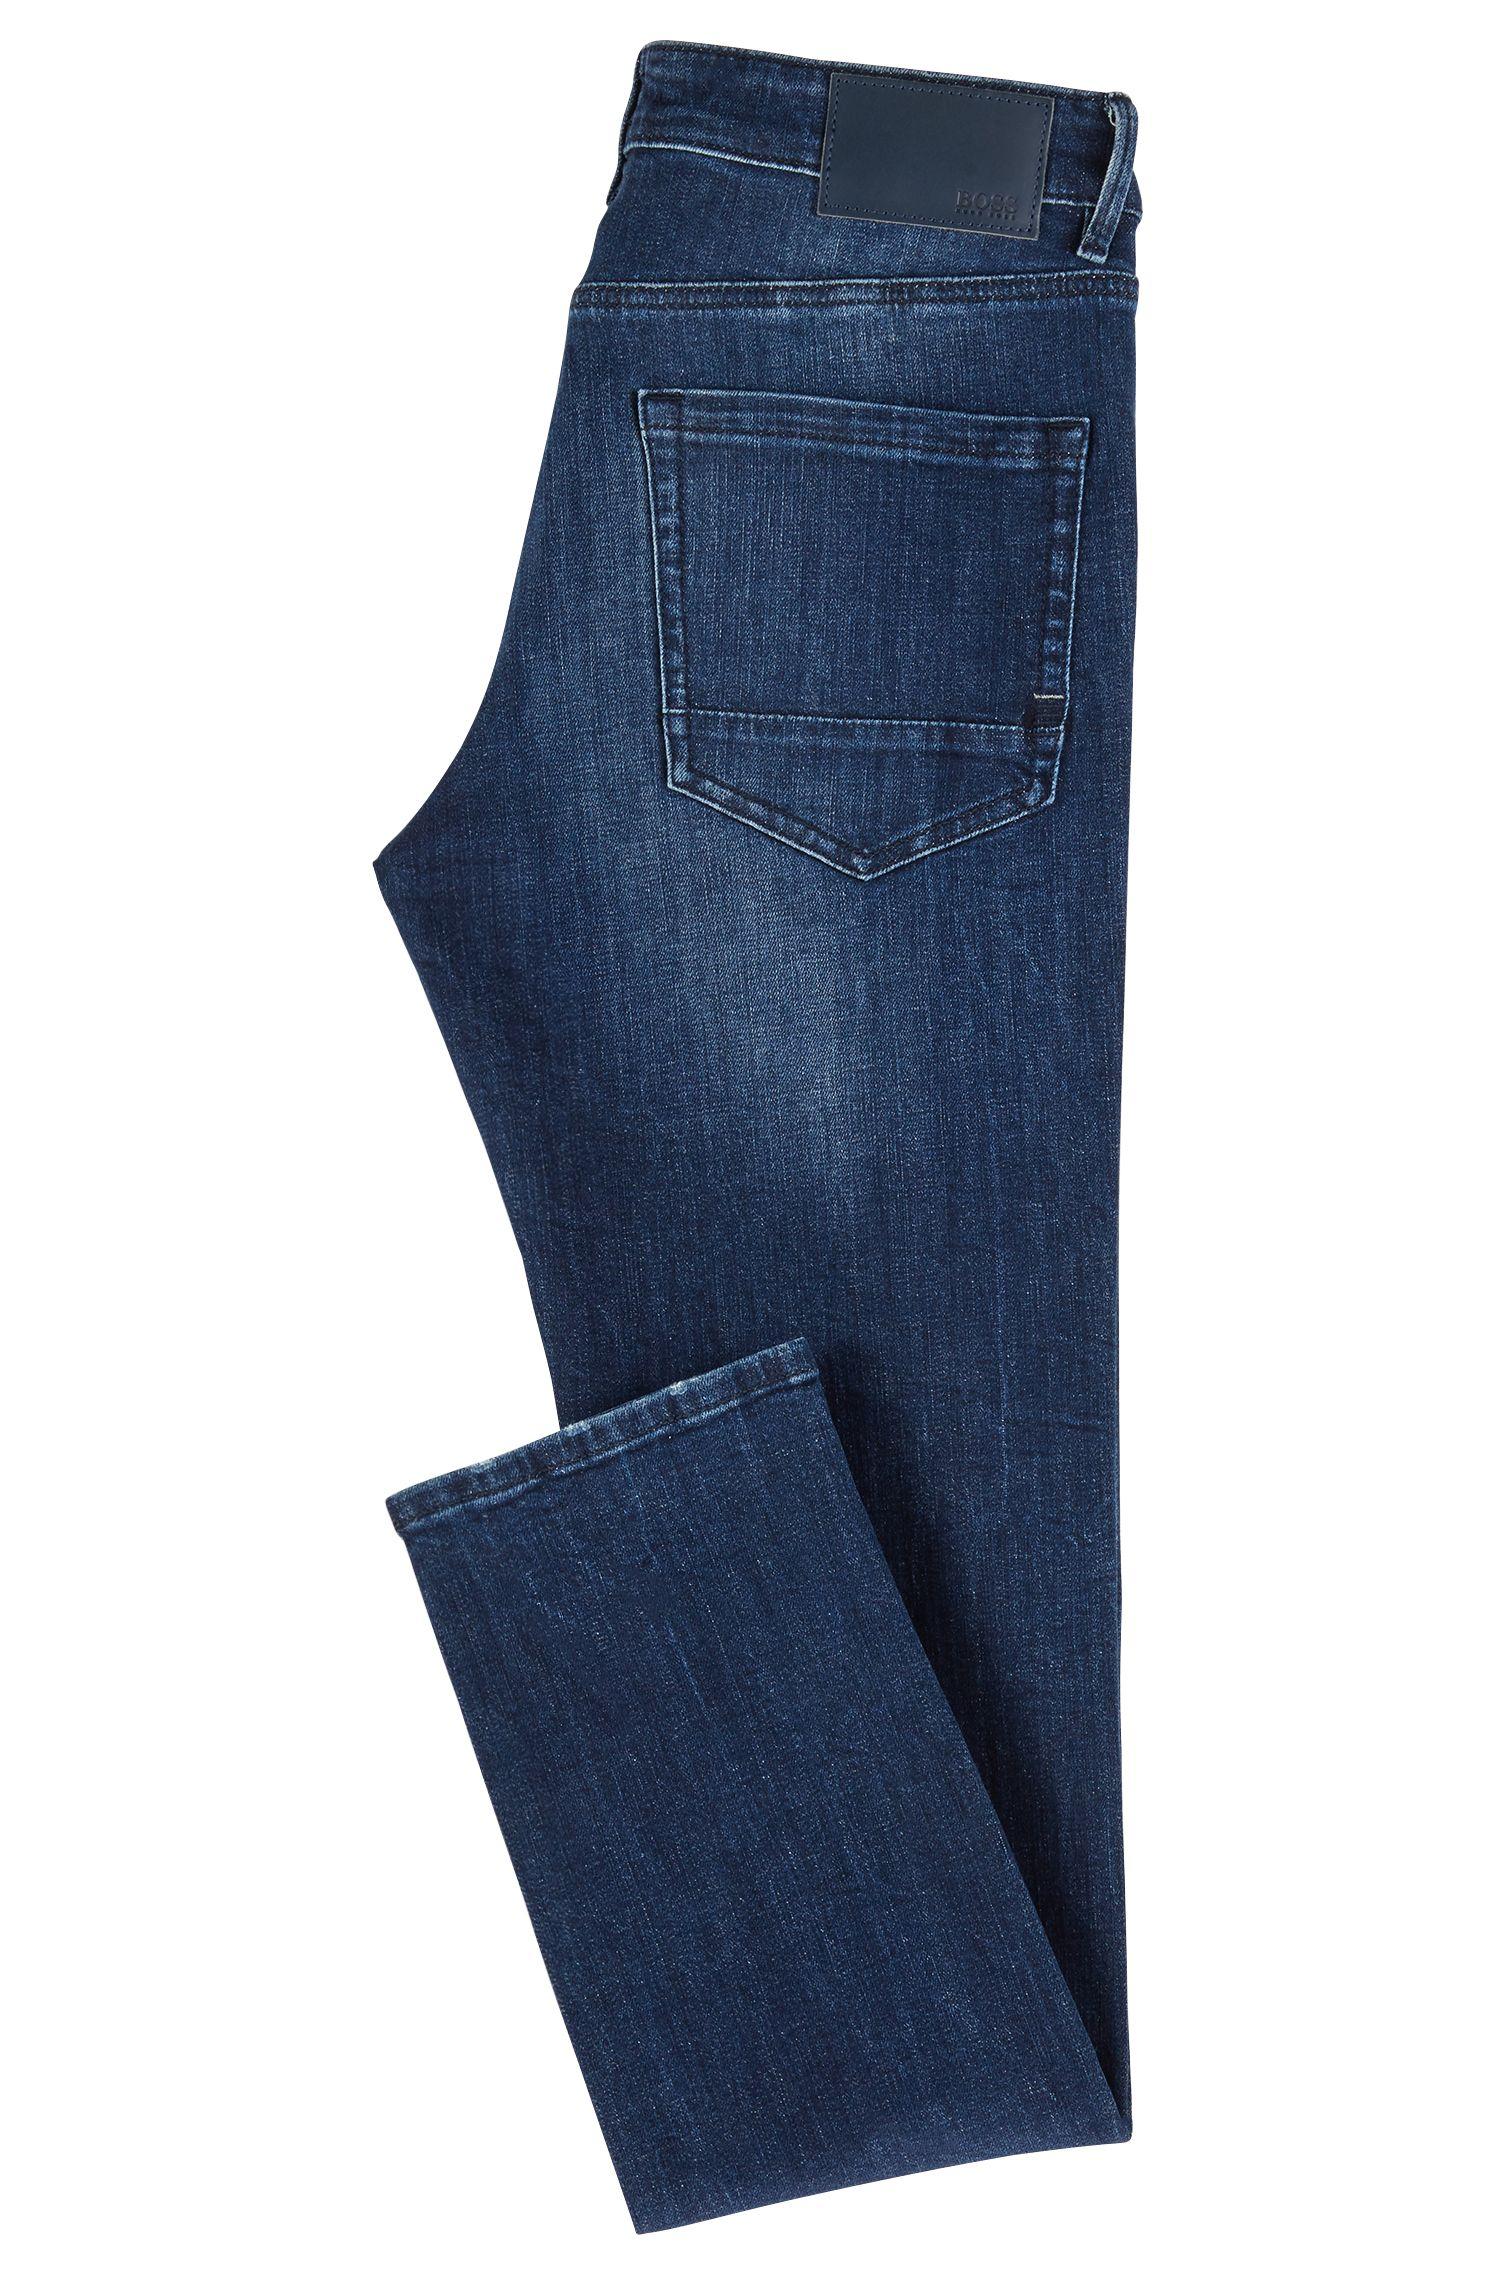 Extra-slim-fit jeans in marble-effect stretch denim, Dark Blue